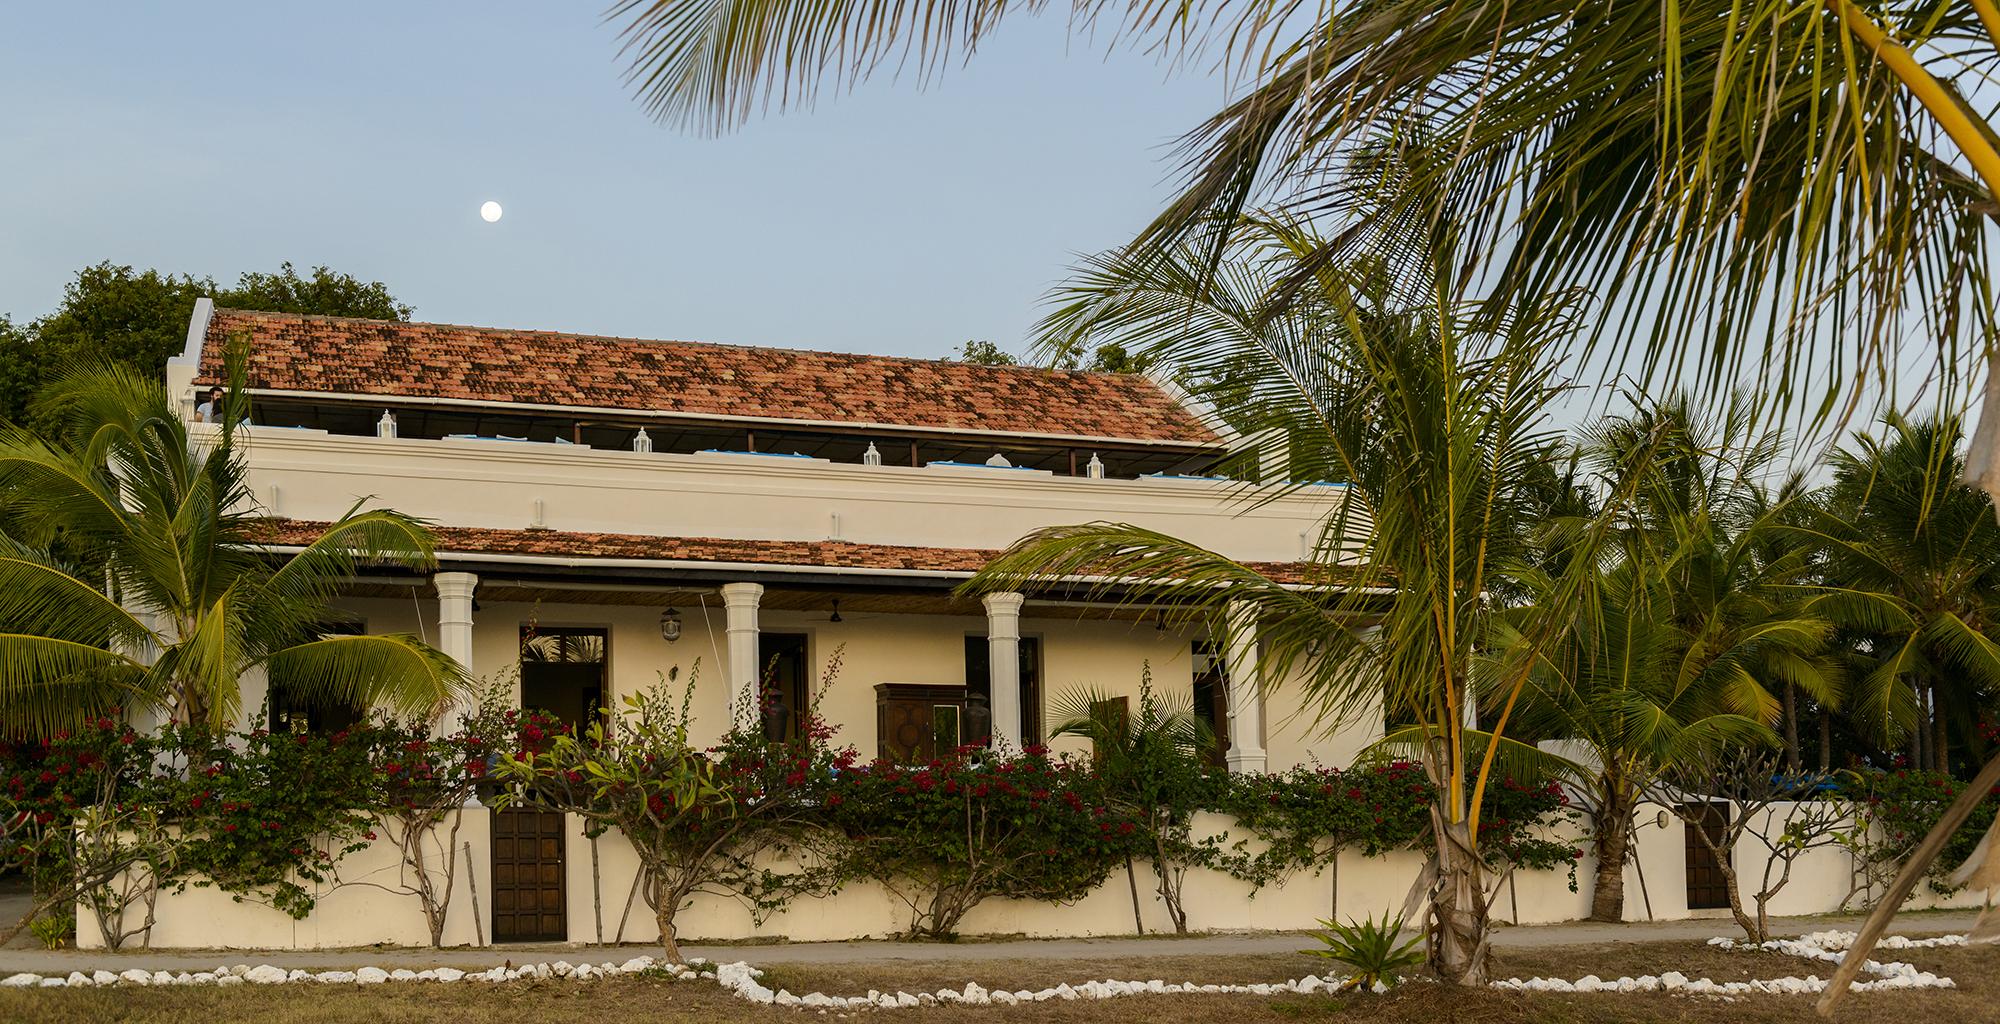 Mozambique-Ibo-Island-Lodge-Exterior